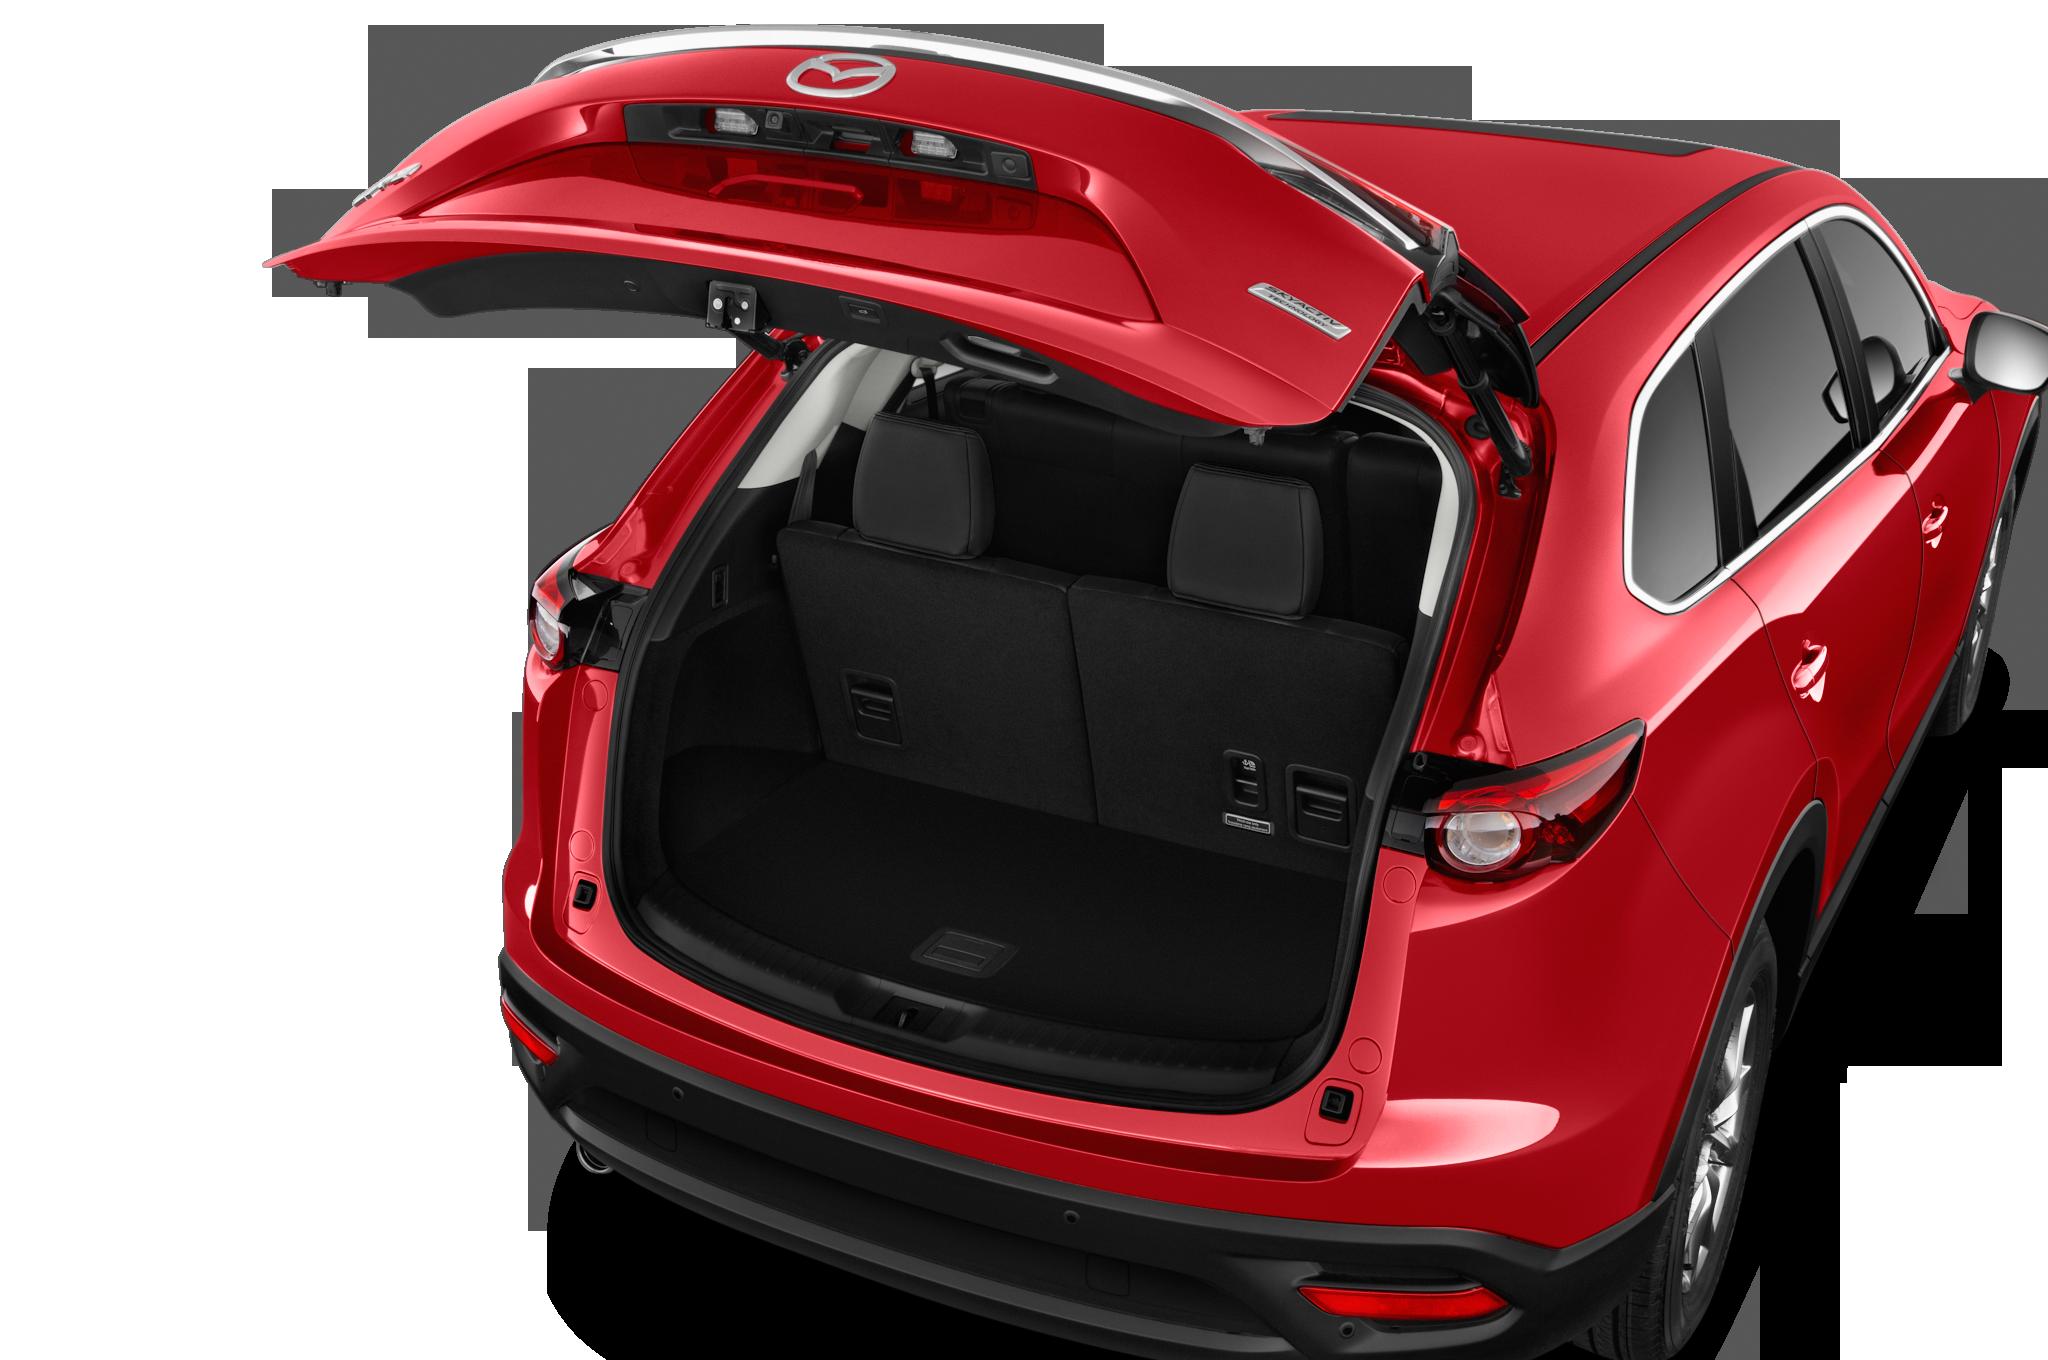 Backside open of Red Mazda Car